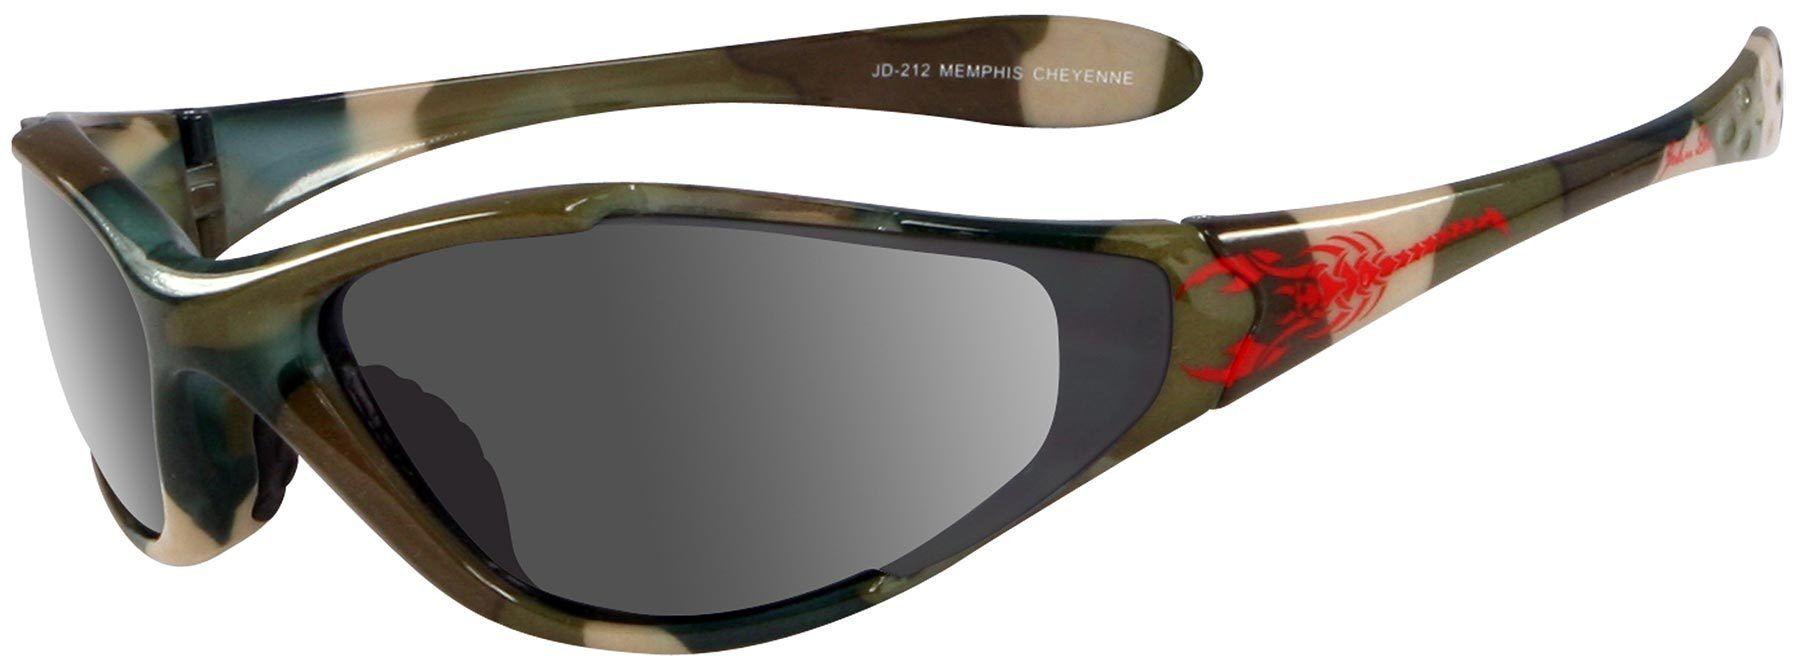 John Doe Cheyenne Sunglasses Grey Green One Size